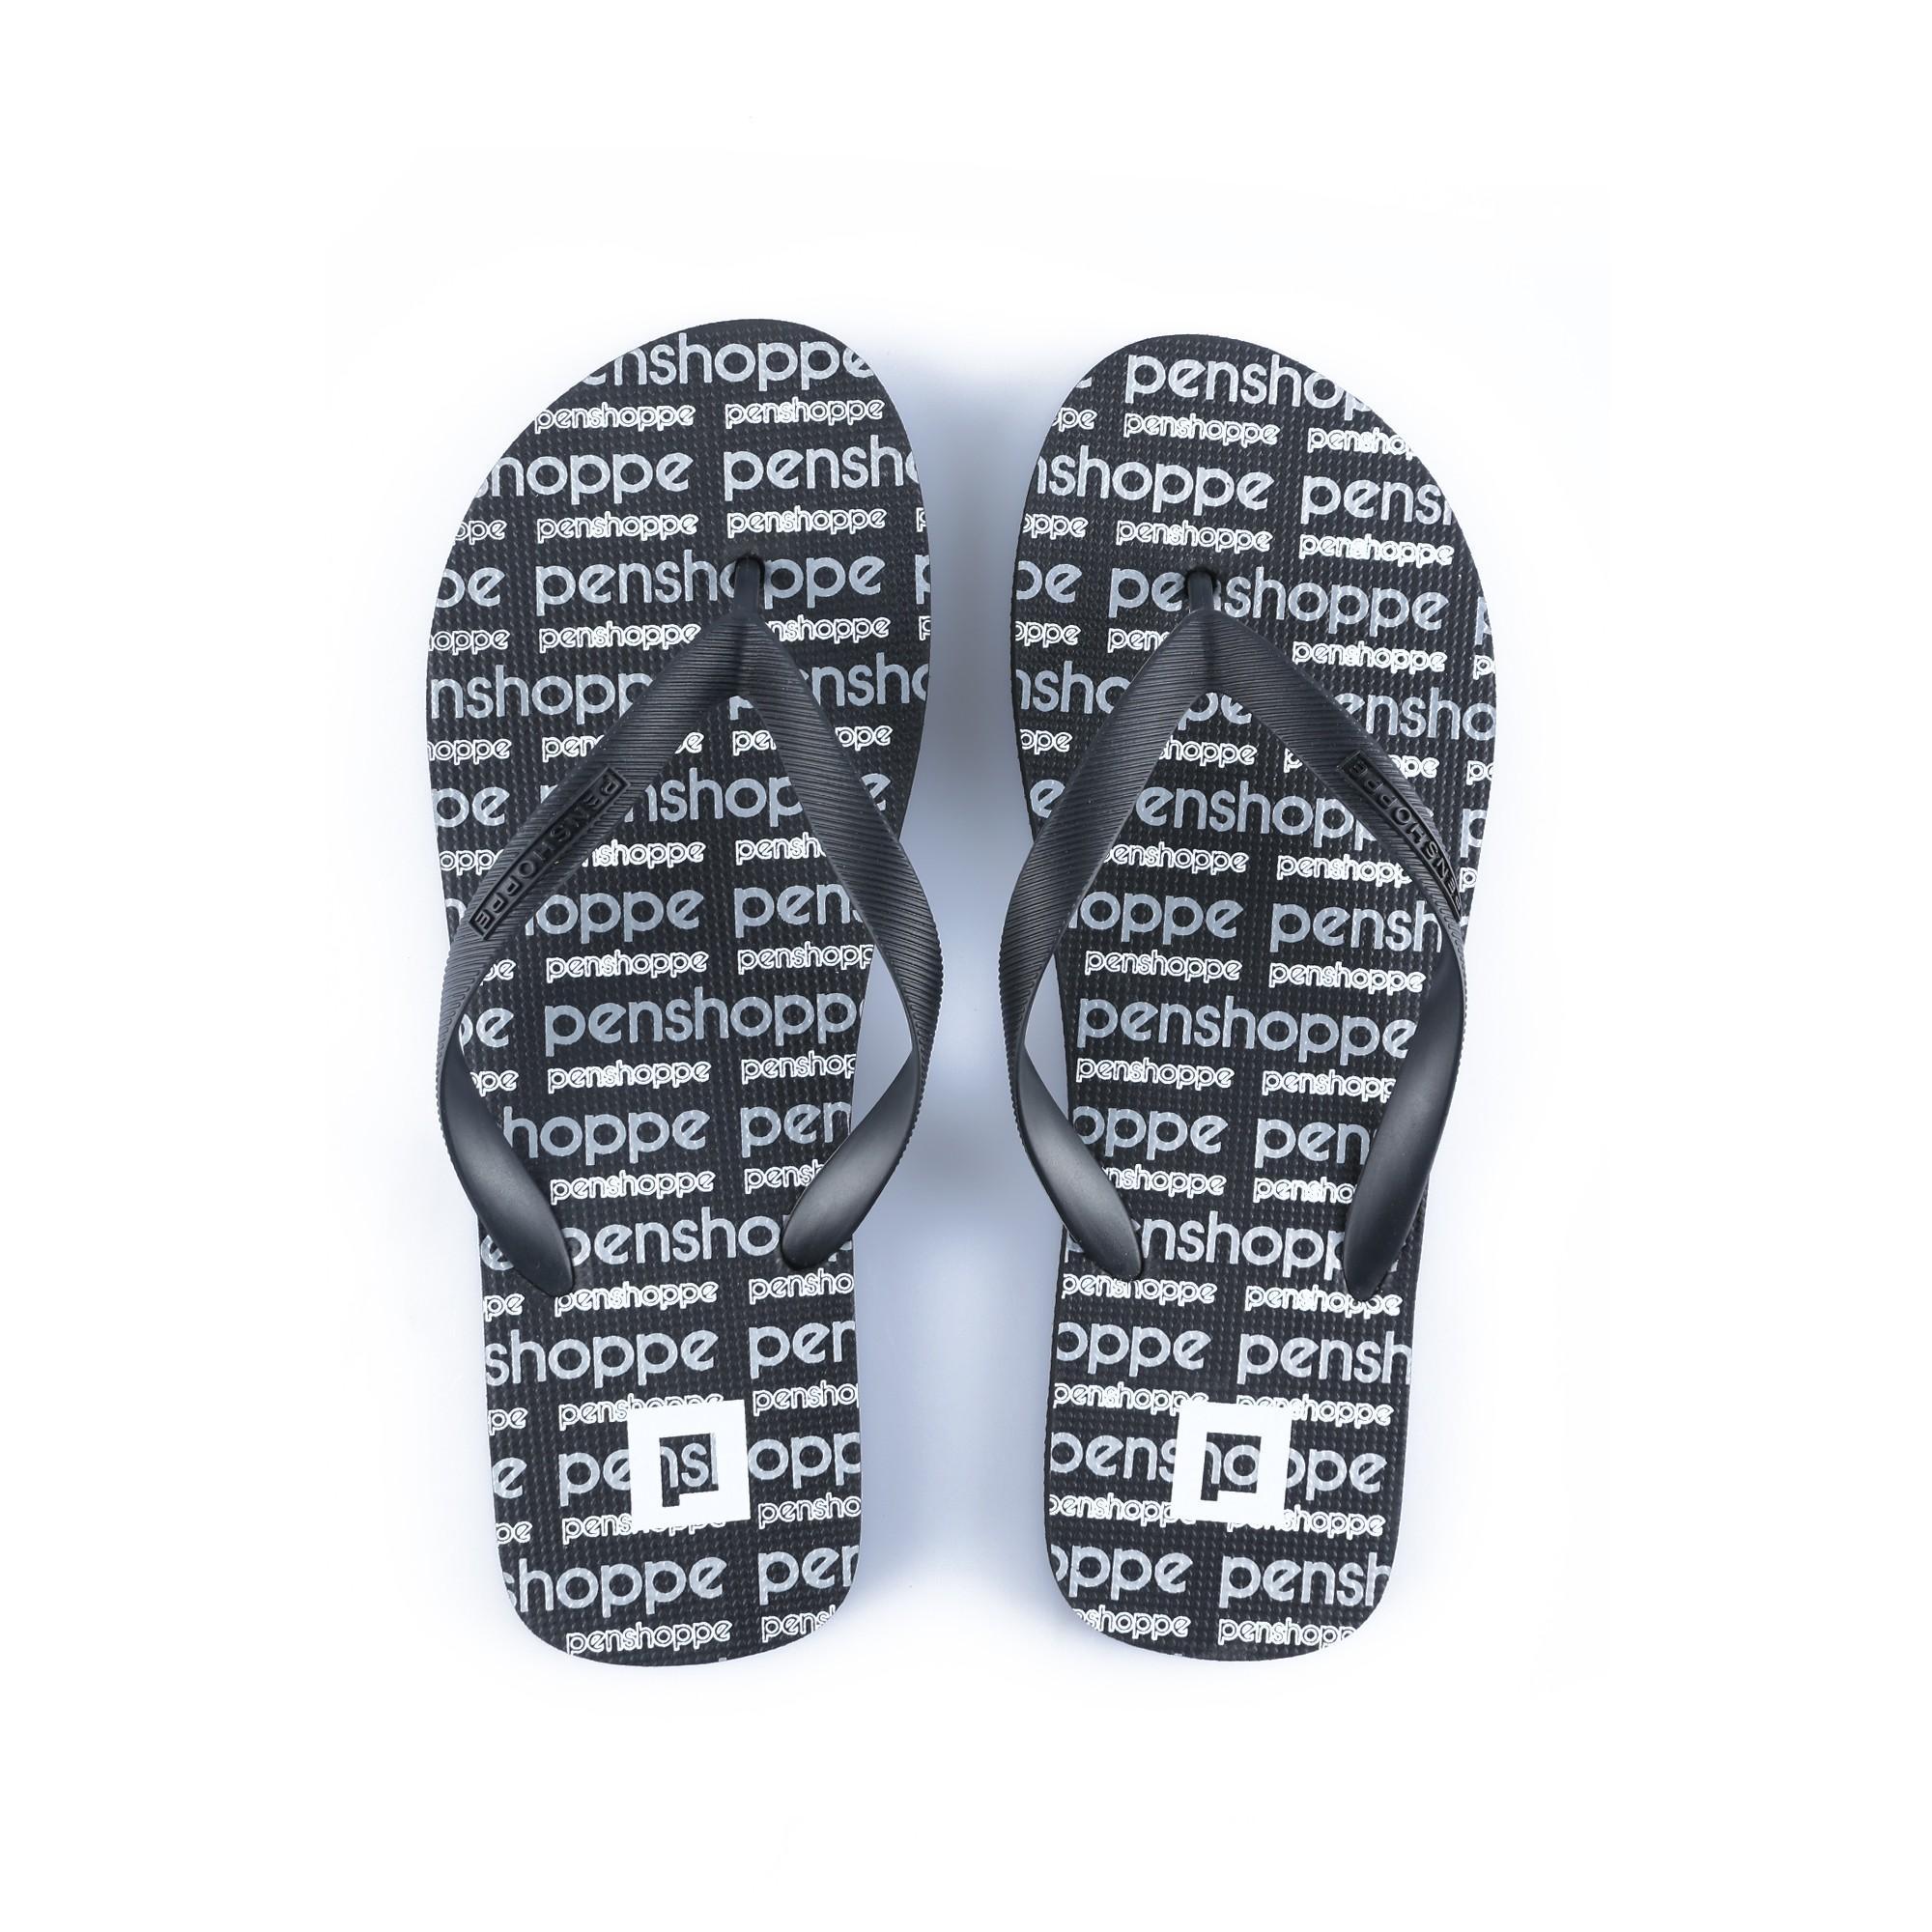 e6d2e047cccb9d Flip Flops for Men for sale - Mens Flip Flops online brands